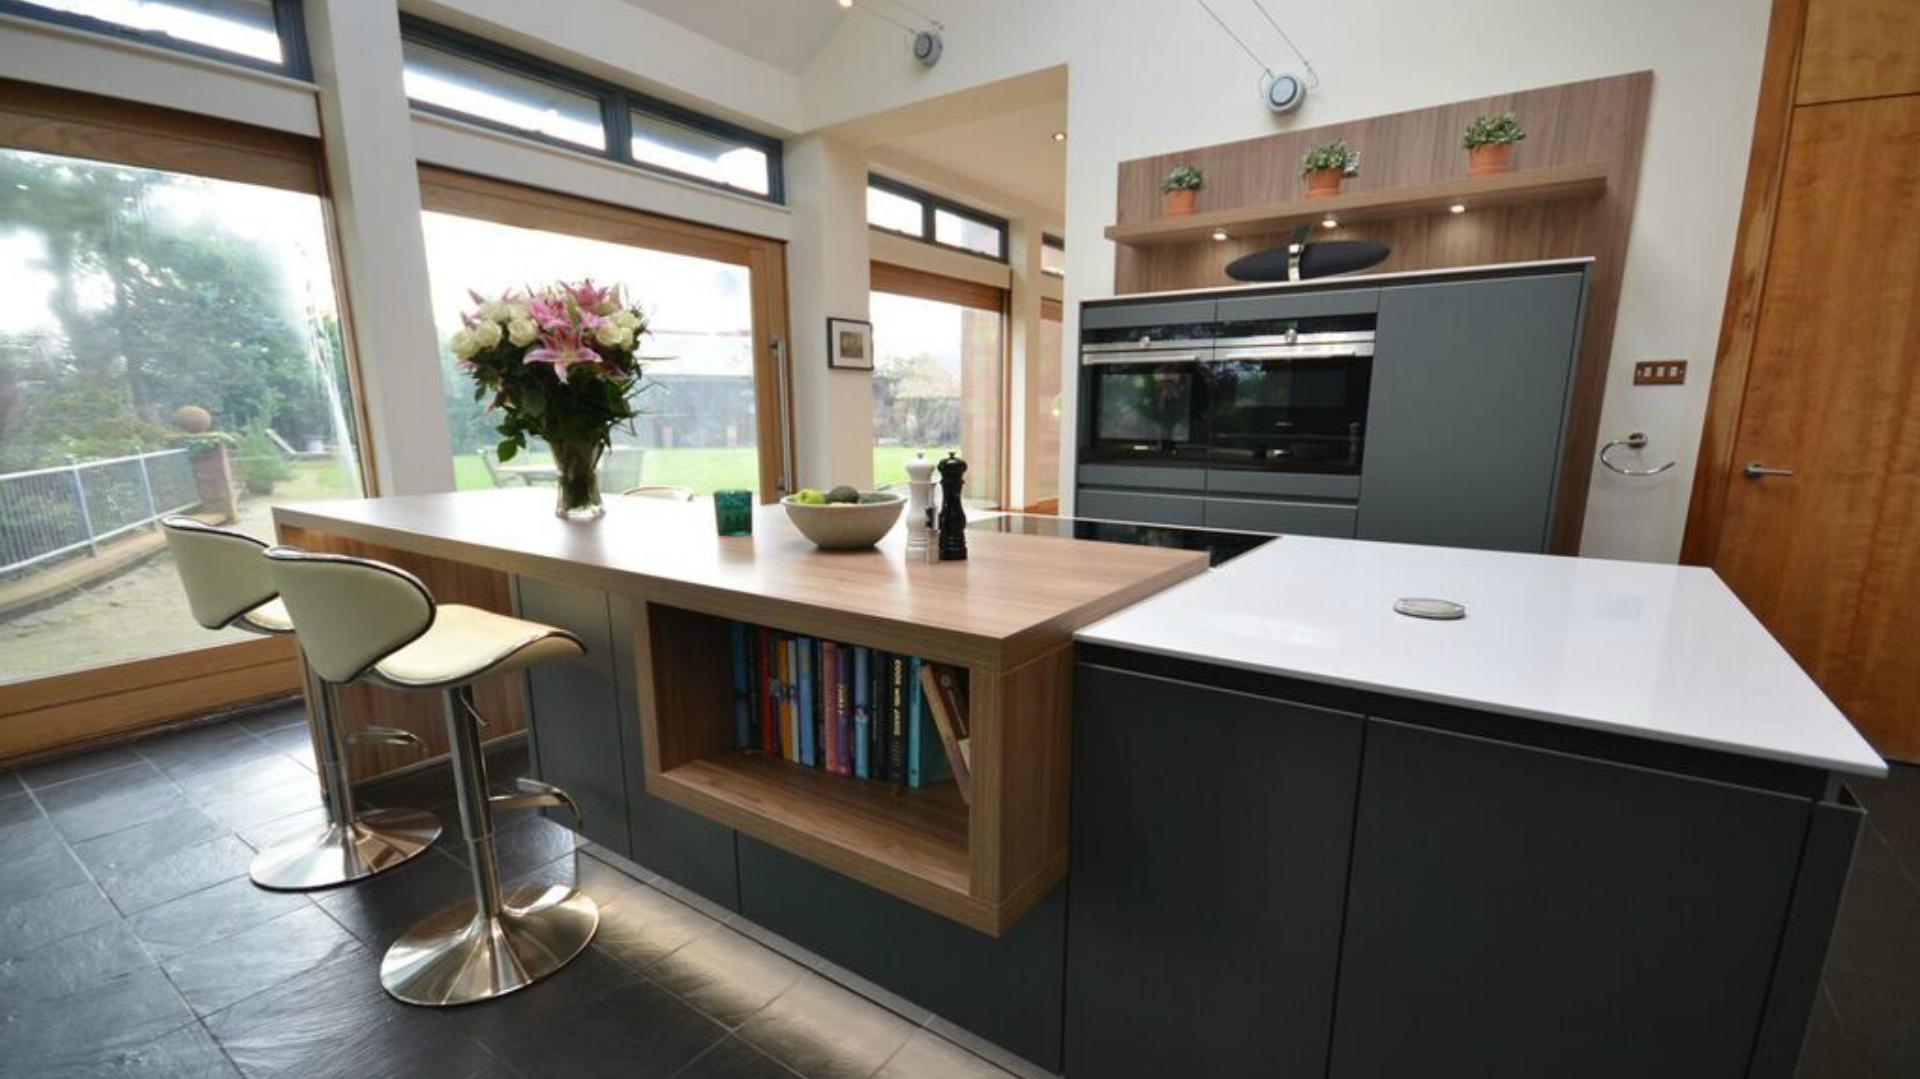 Gavin Stacey S New Kitchen Palazzo Kitchens